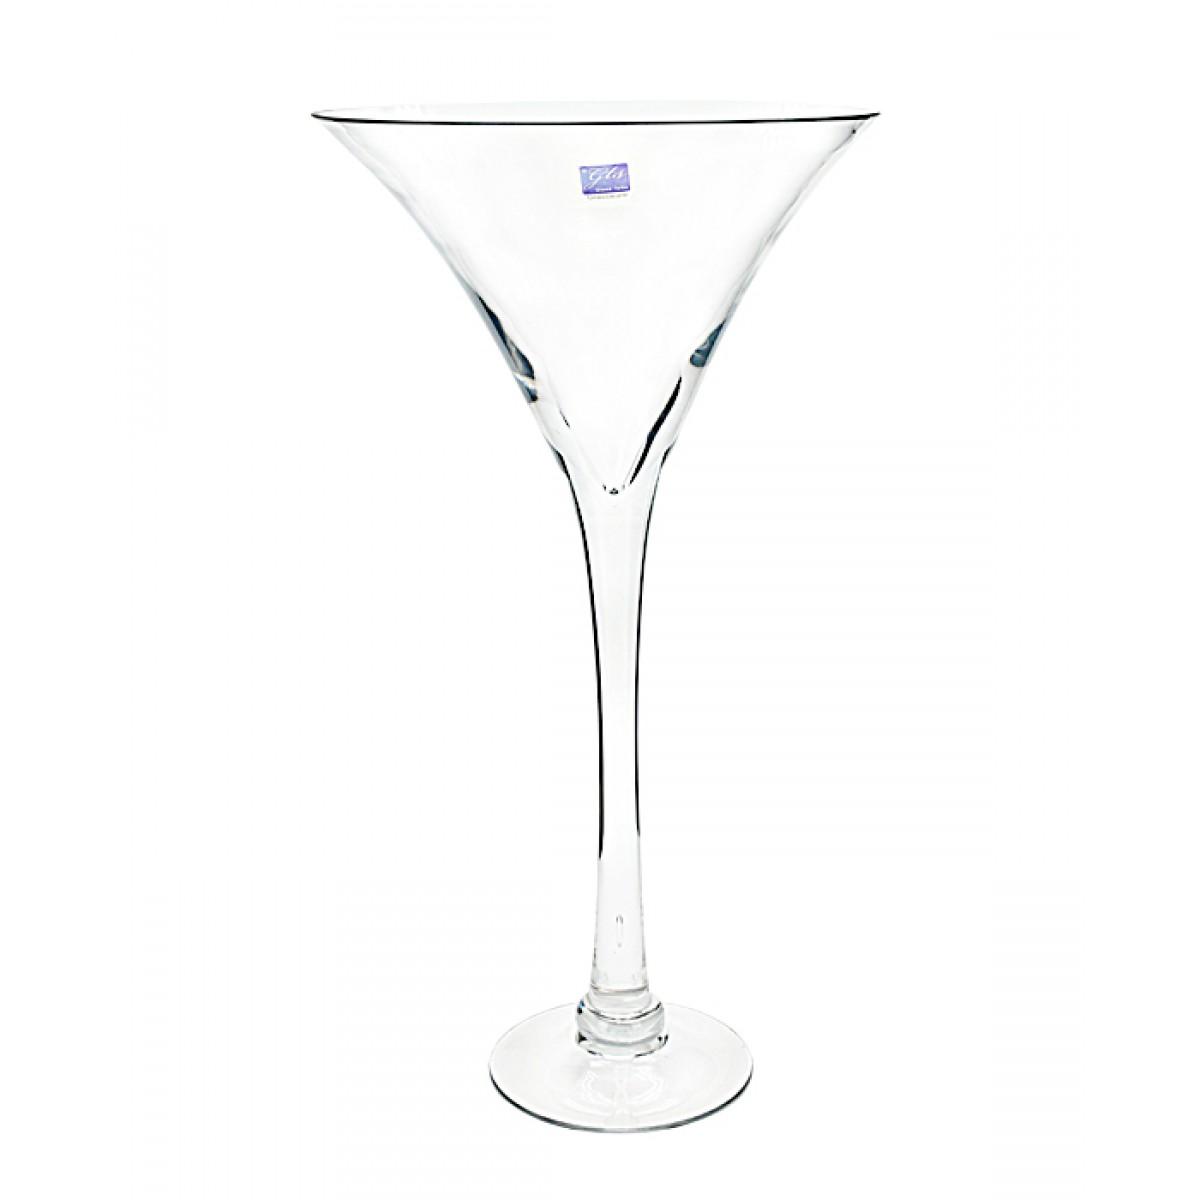 Martini vase 50cmh clear 22 glass martini vase 50cmh clear 22 reviewsmspy